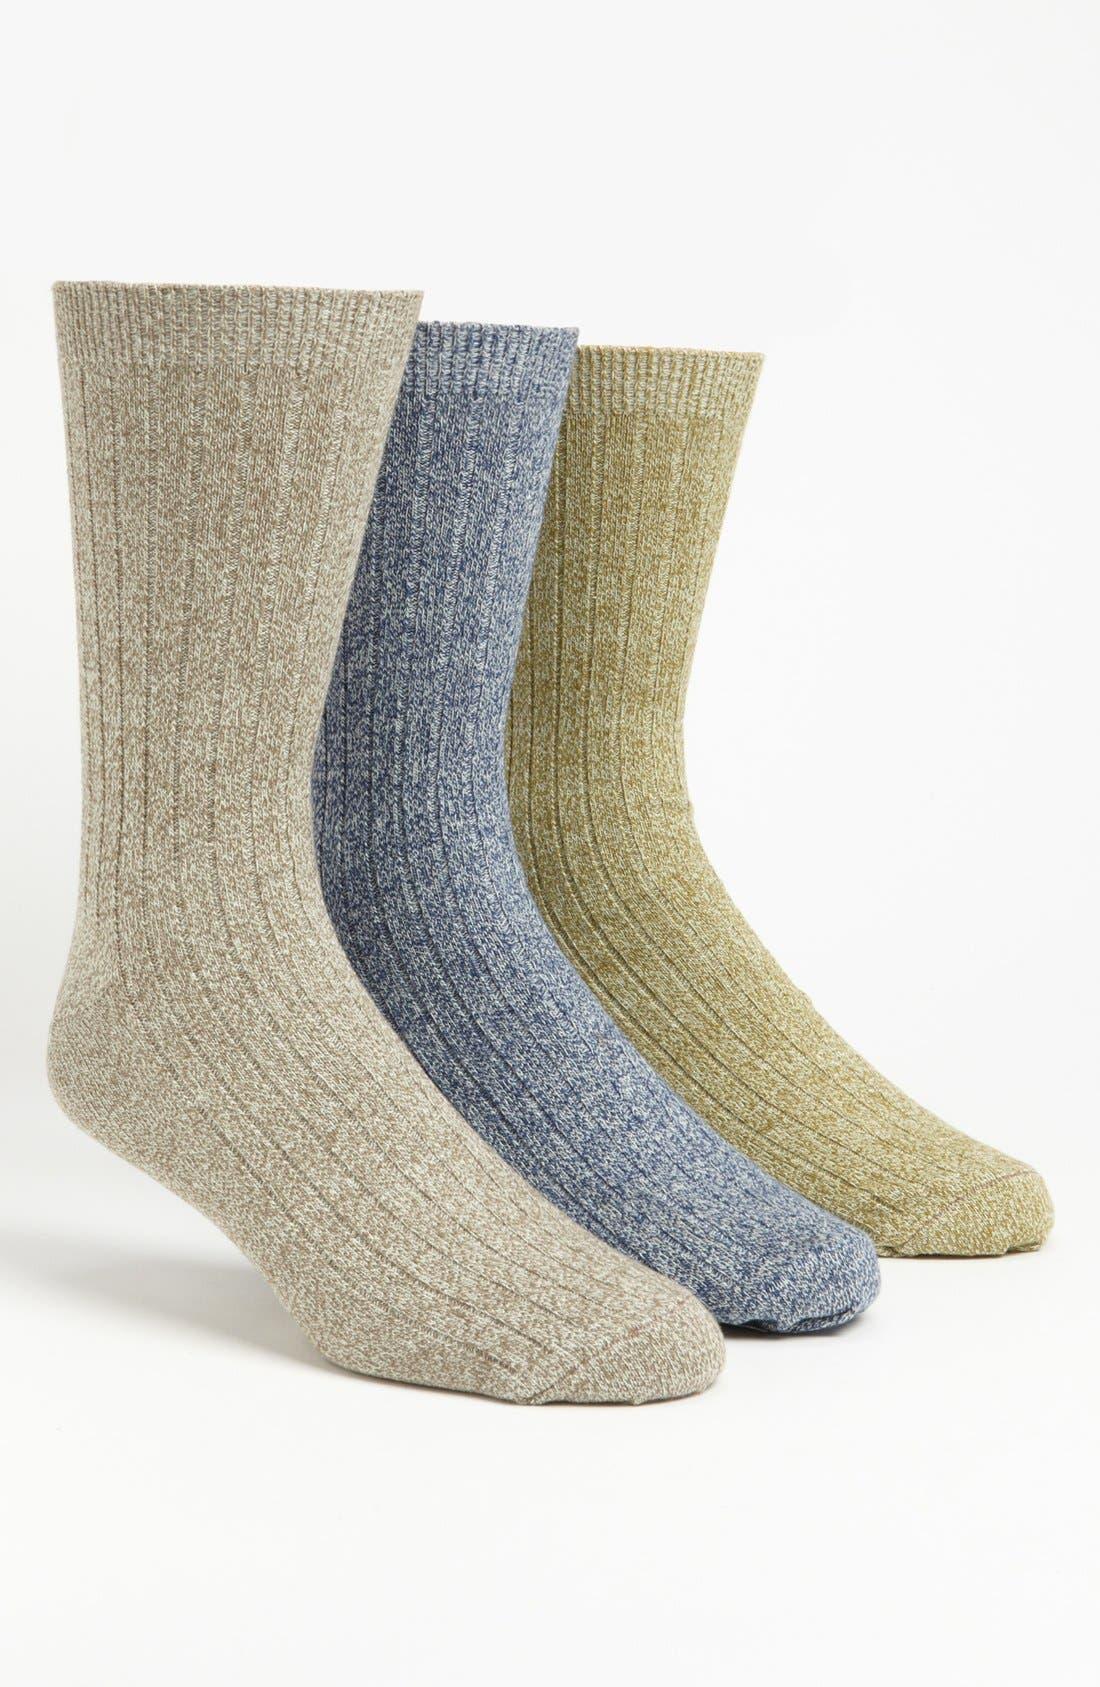 Alternate Image 1 Selected - Topman Marled Socks (3-Pack)